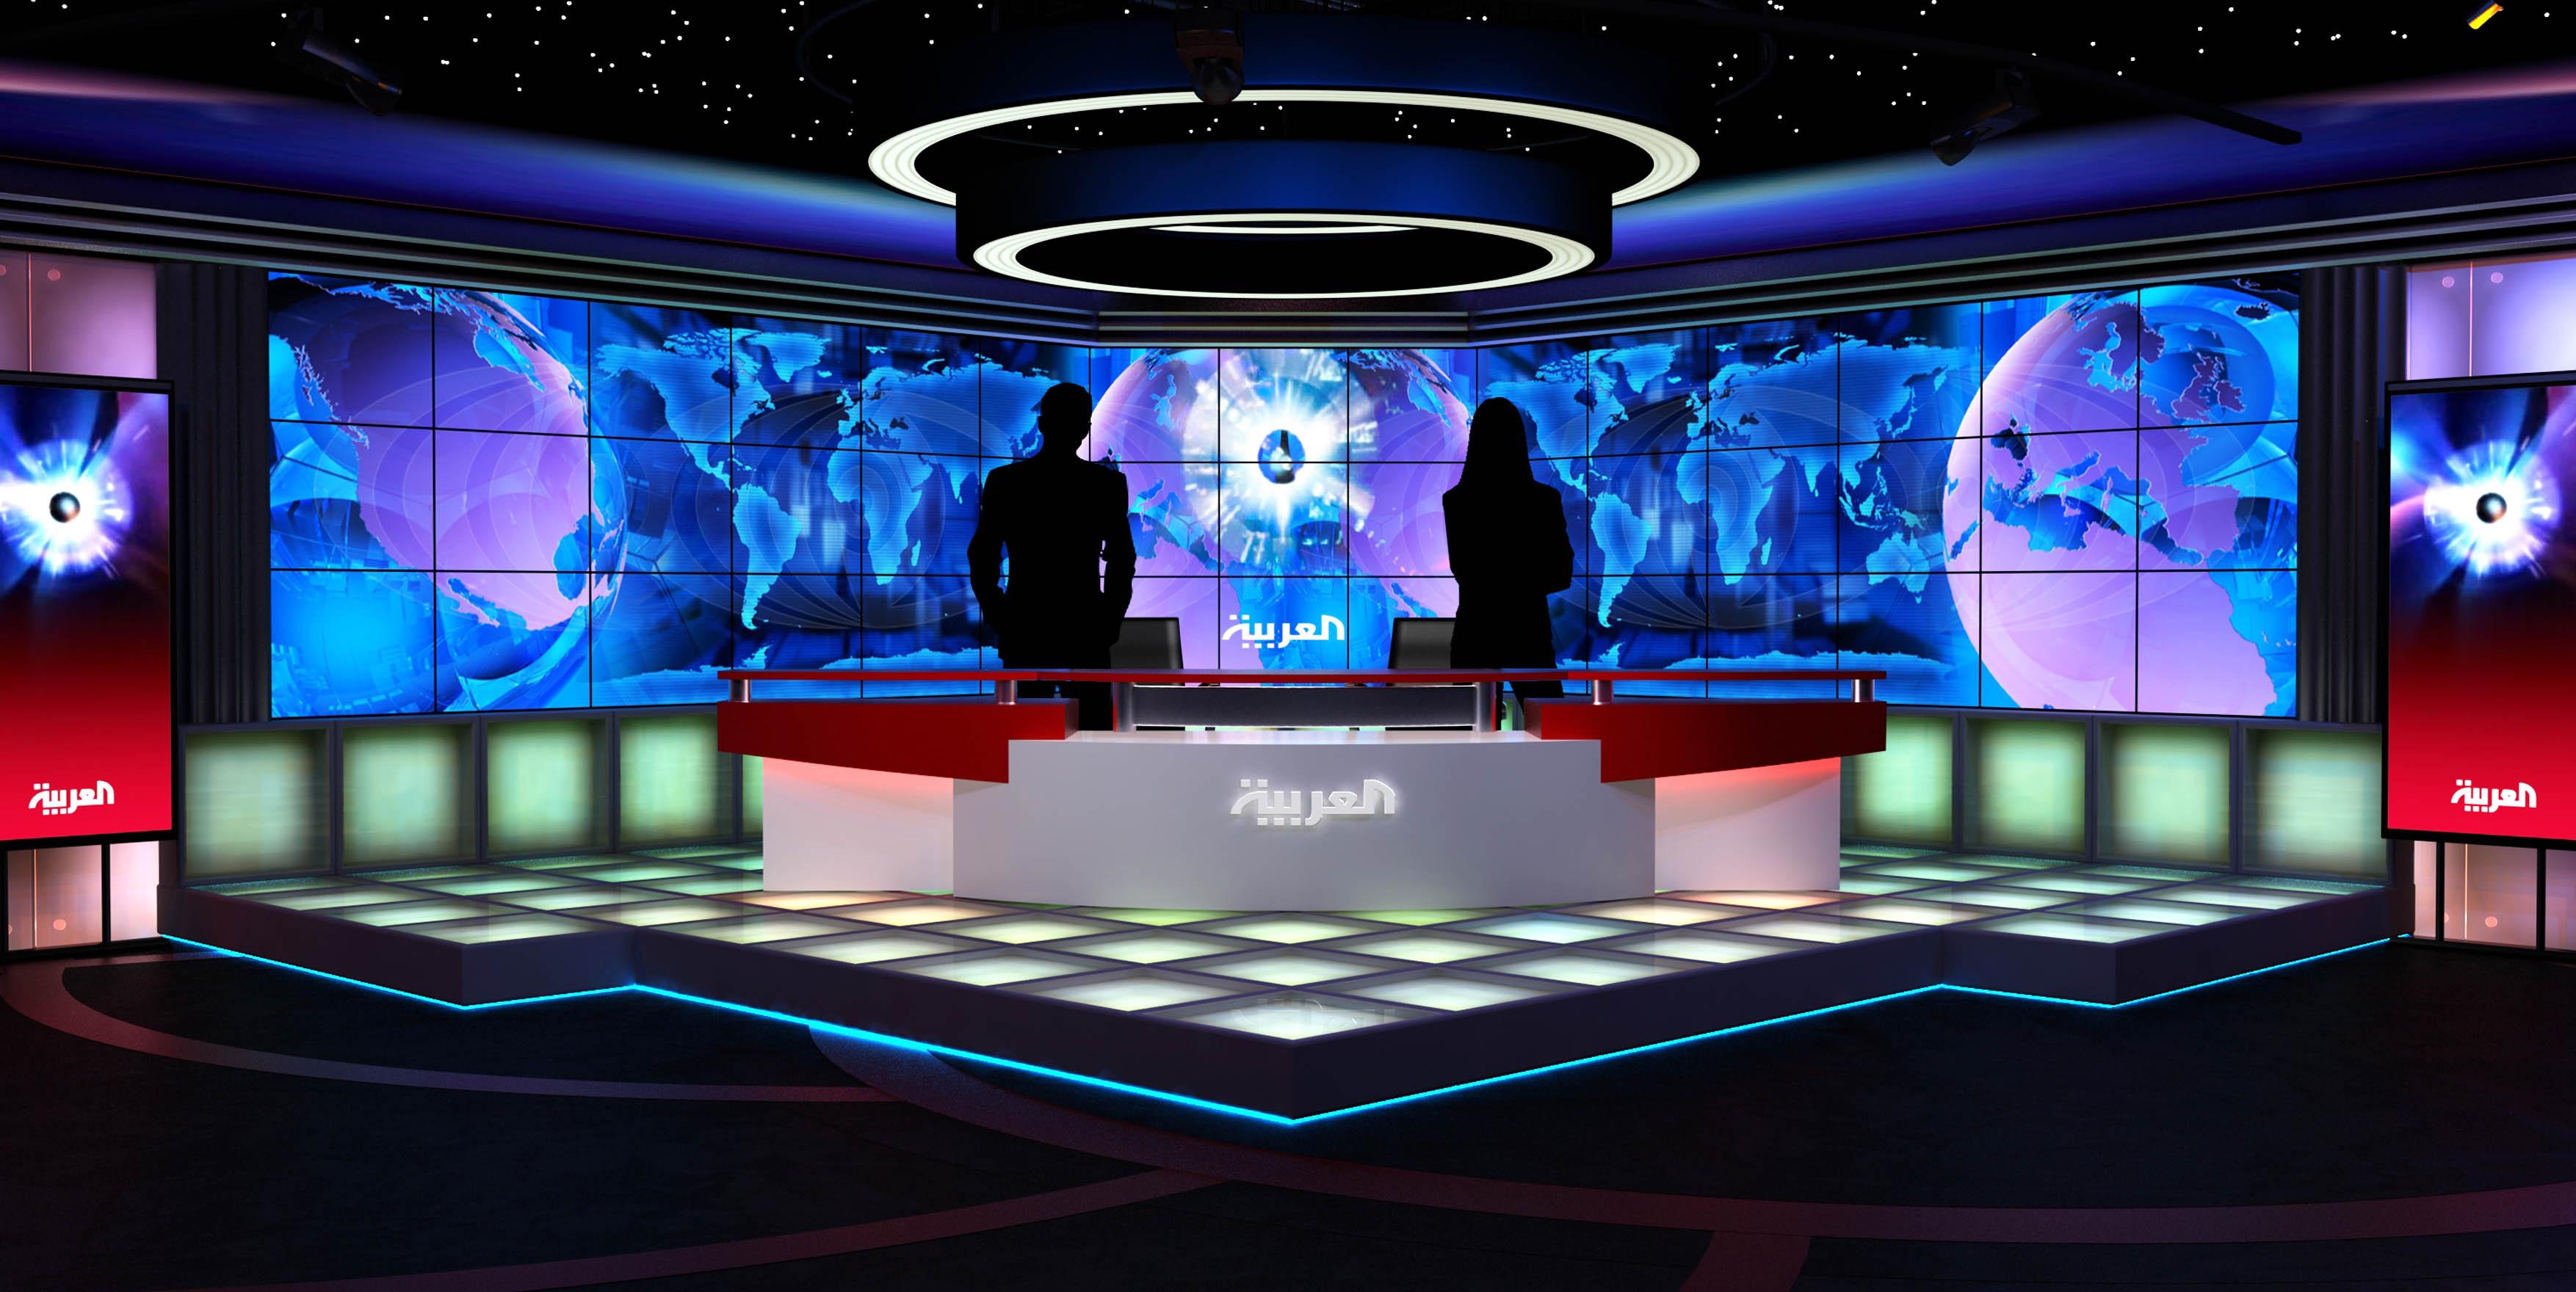 News Studio Joy Studio Design Gallery Best Design Interiors Inside Ideas Interiors design about Everything [magnanprojects.com]